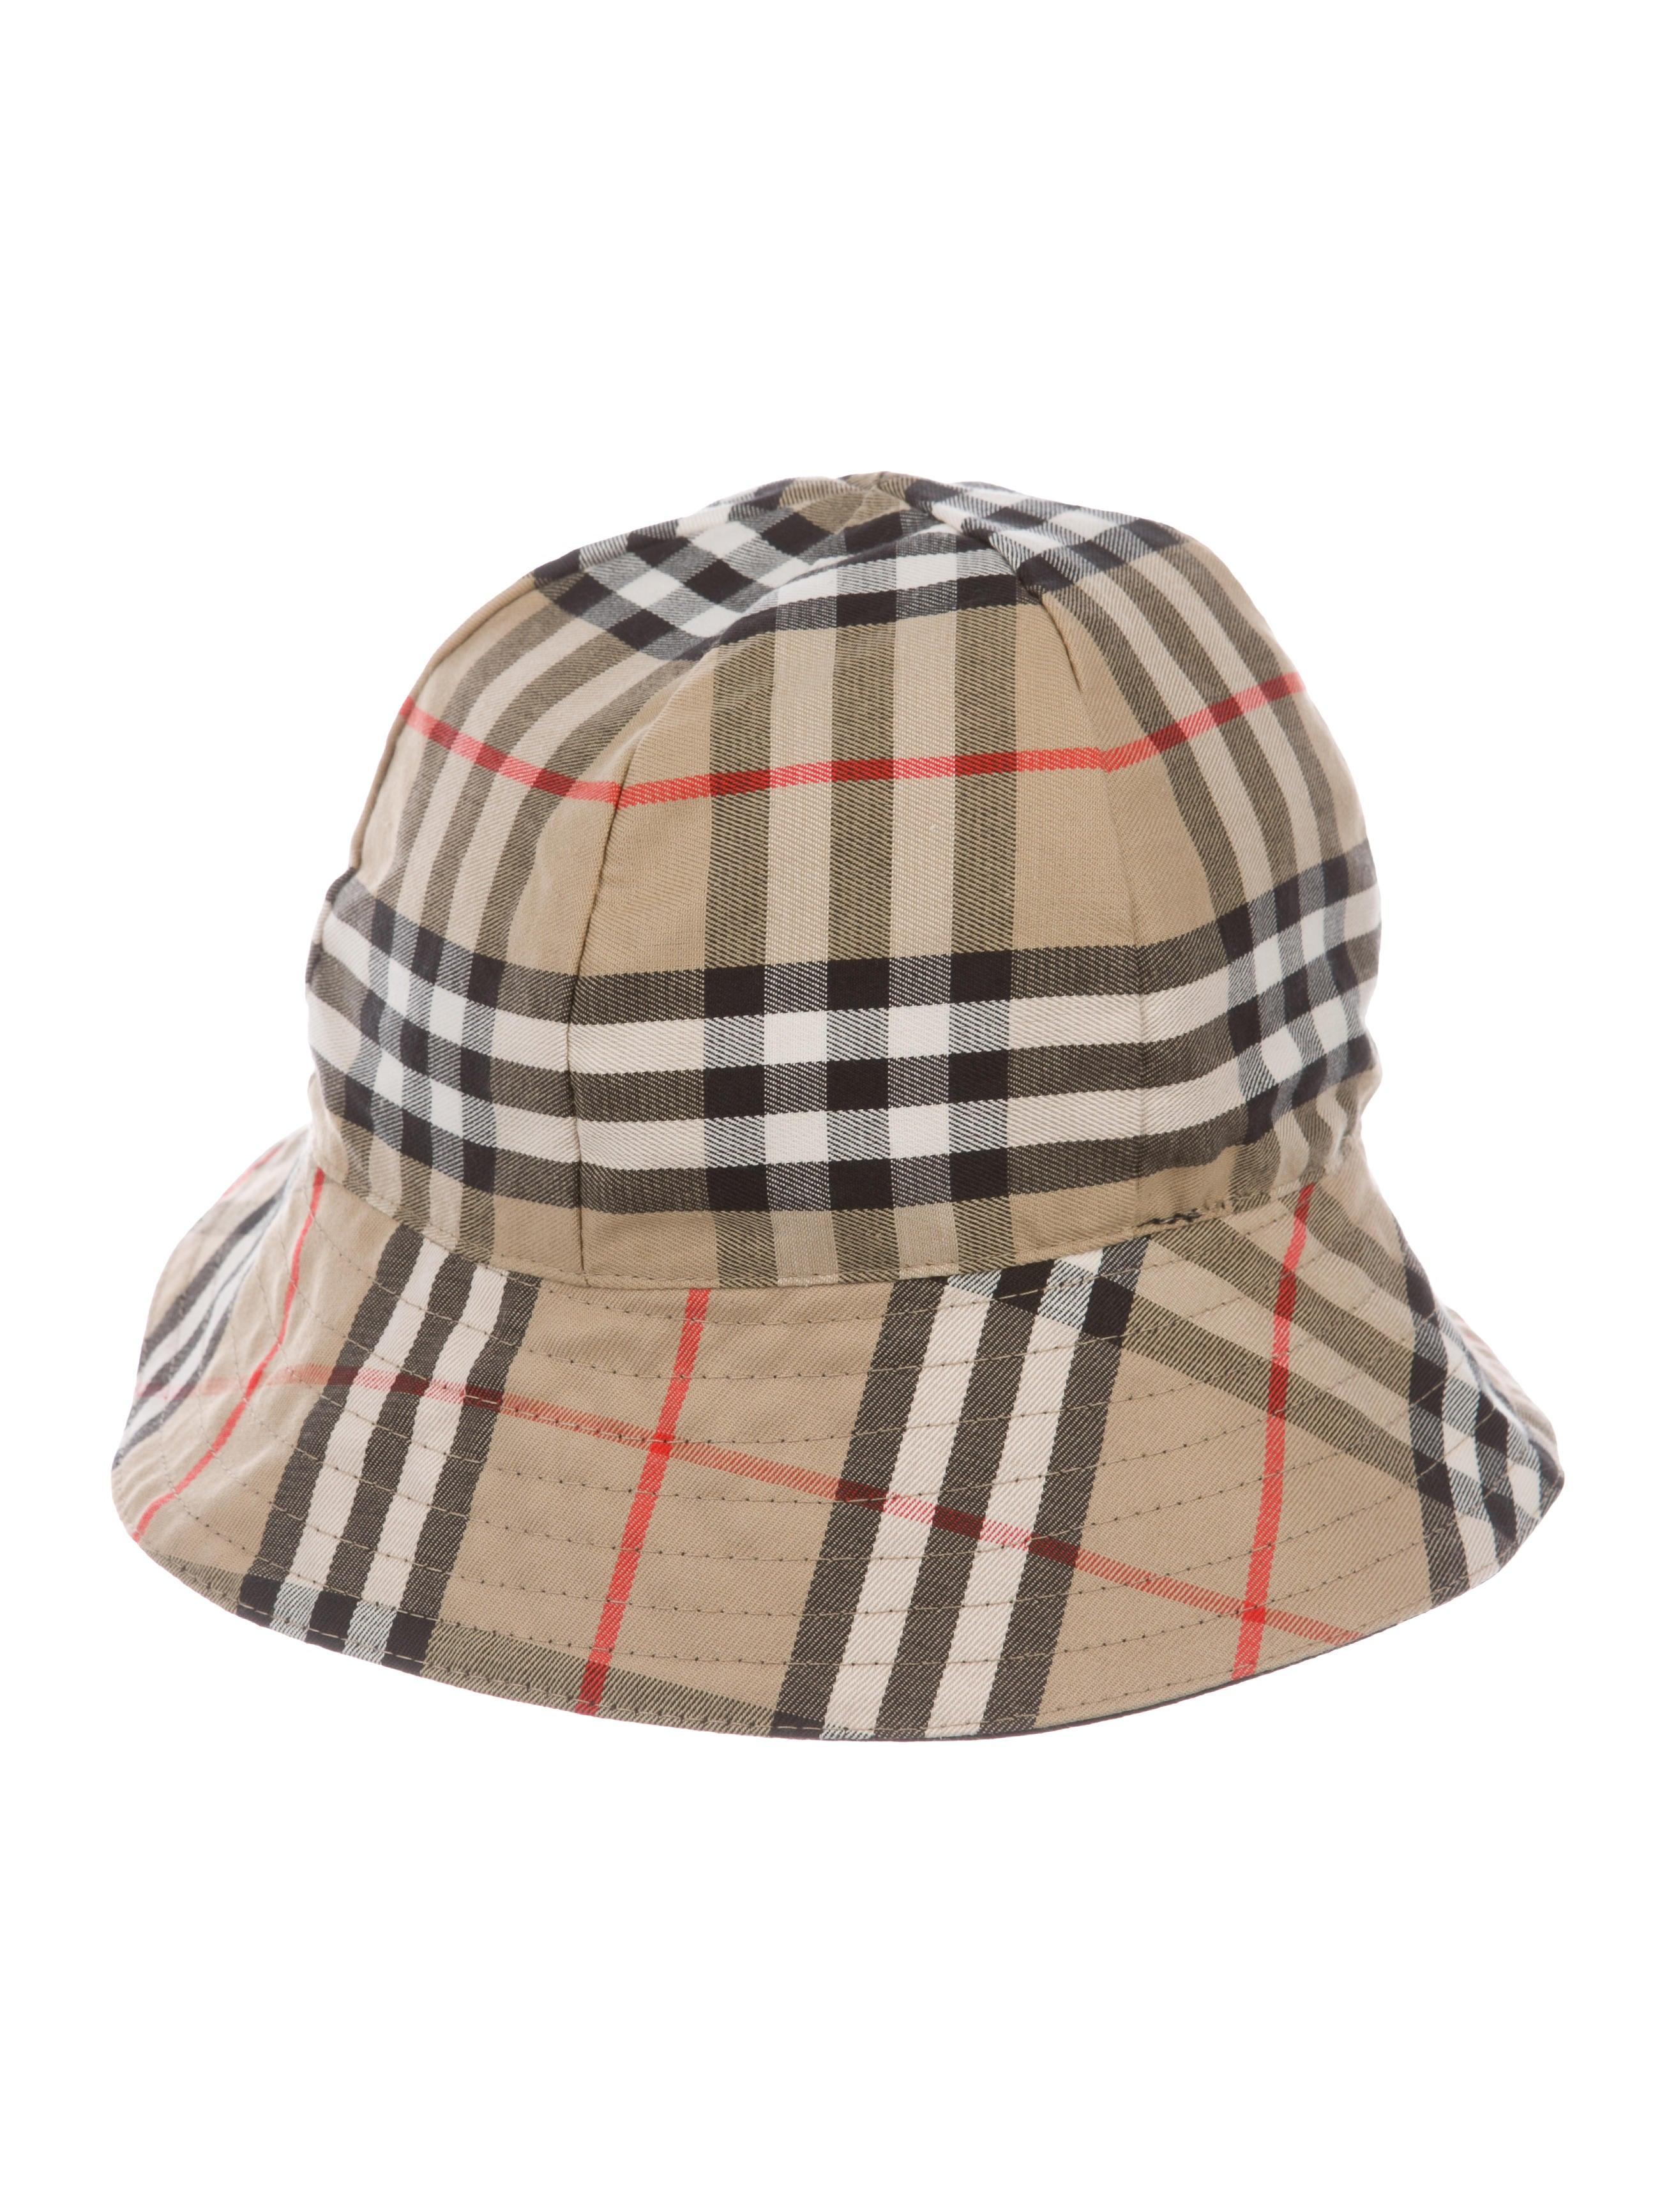 Burberry Nova Check Reversible Hat - Accessories - BUR95064  7c61170f783